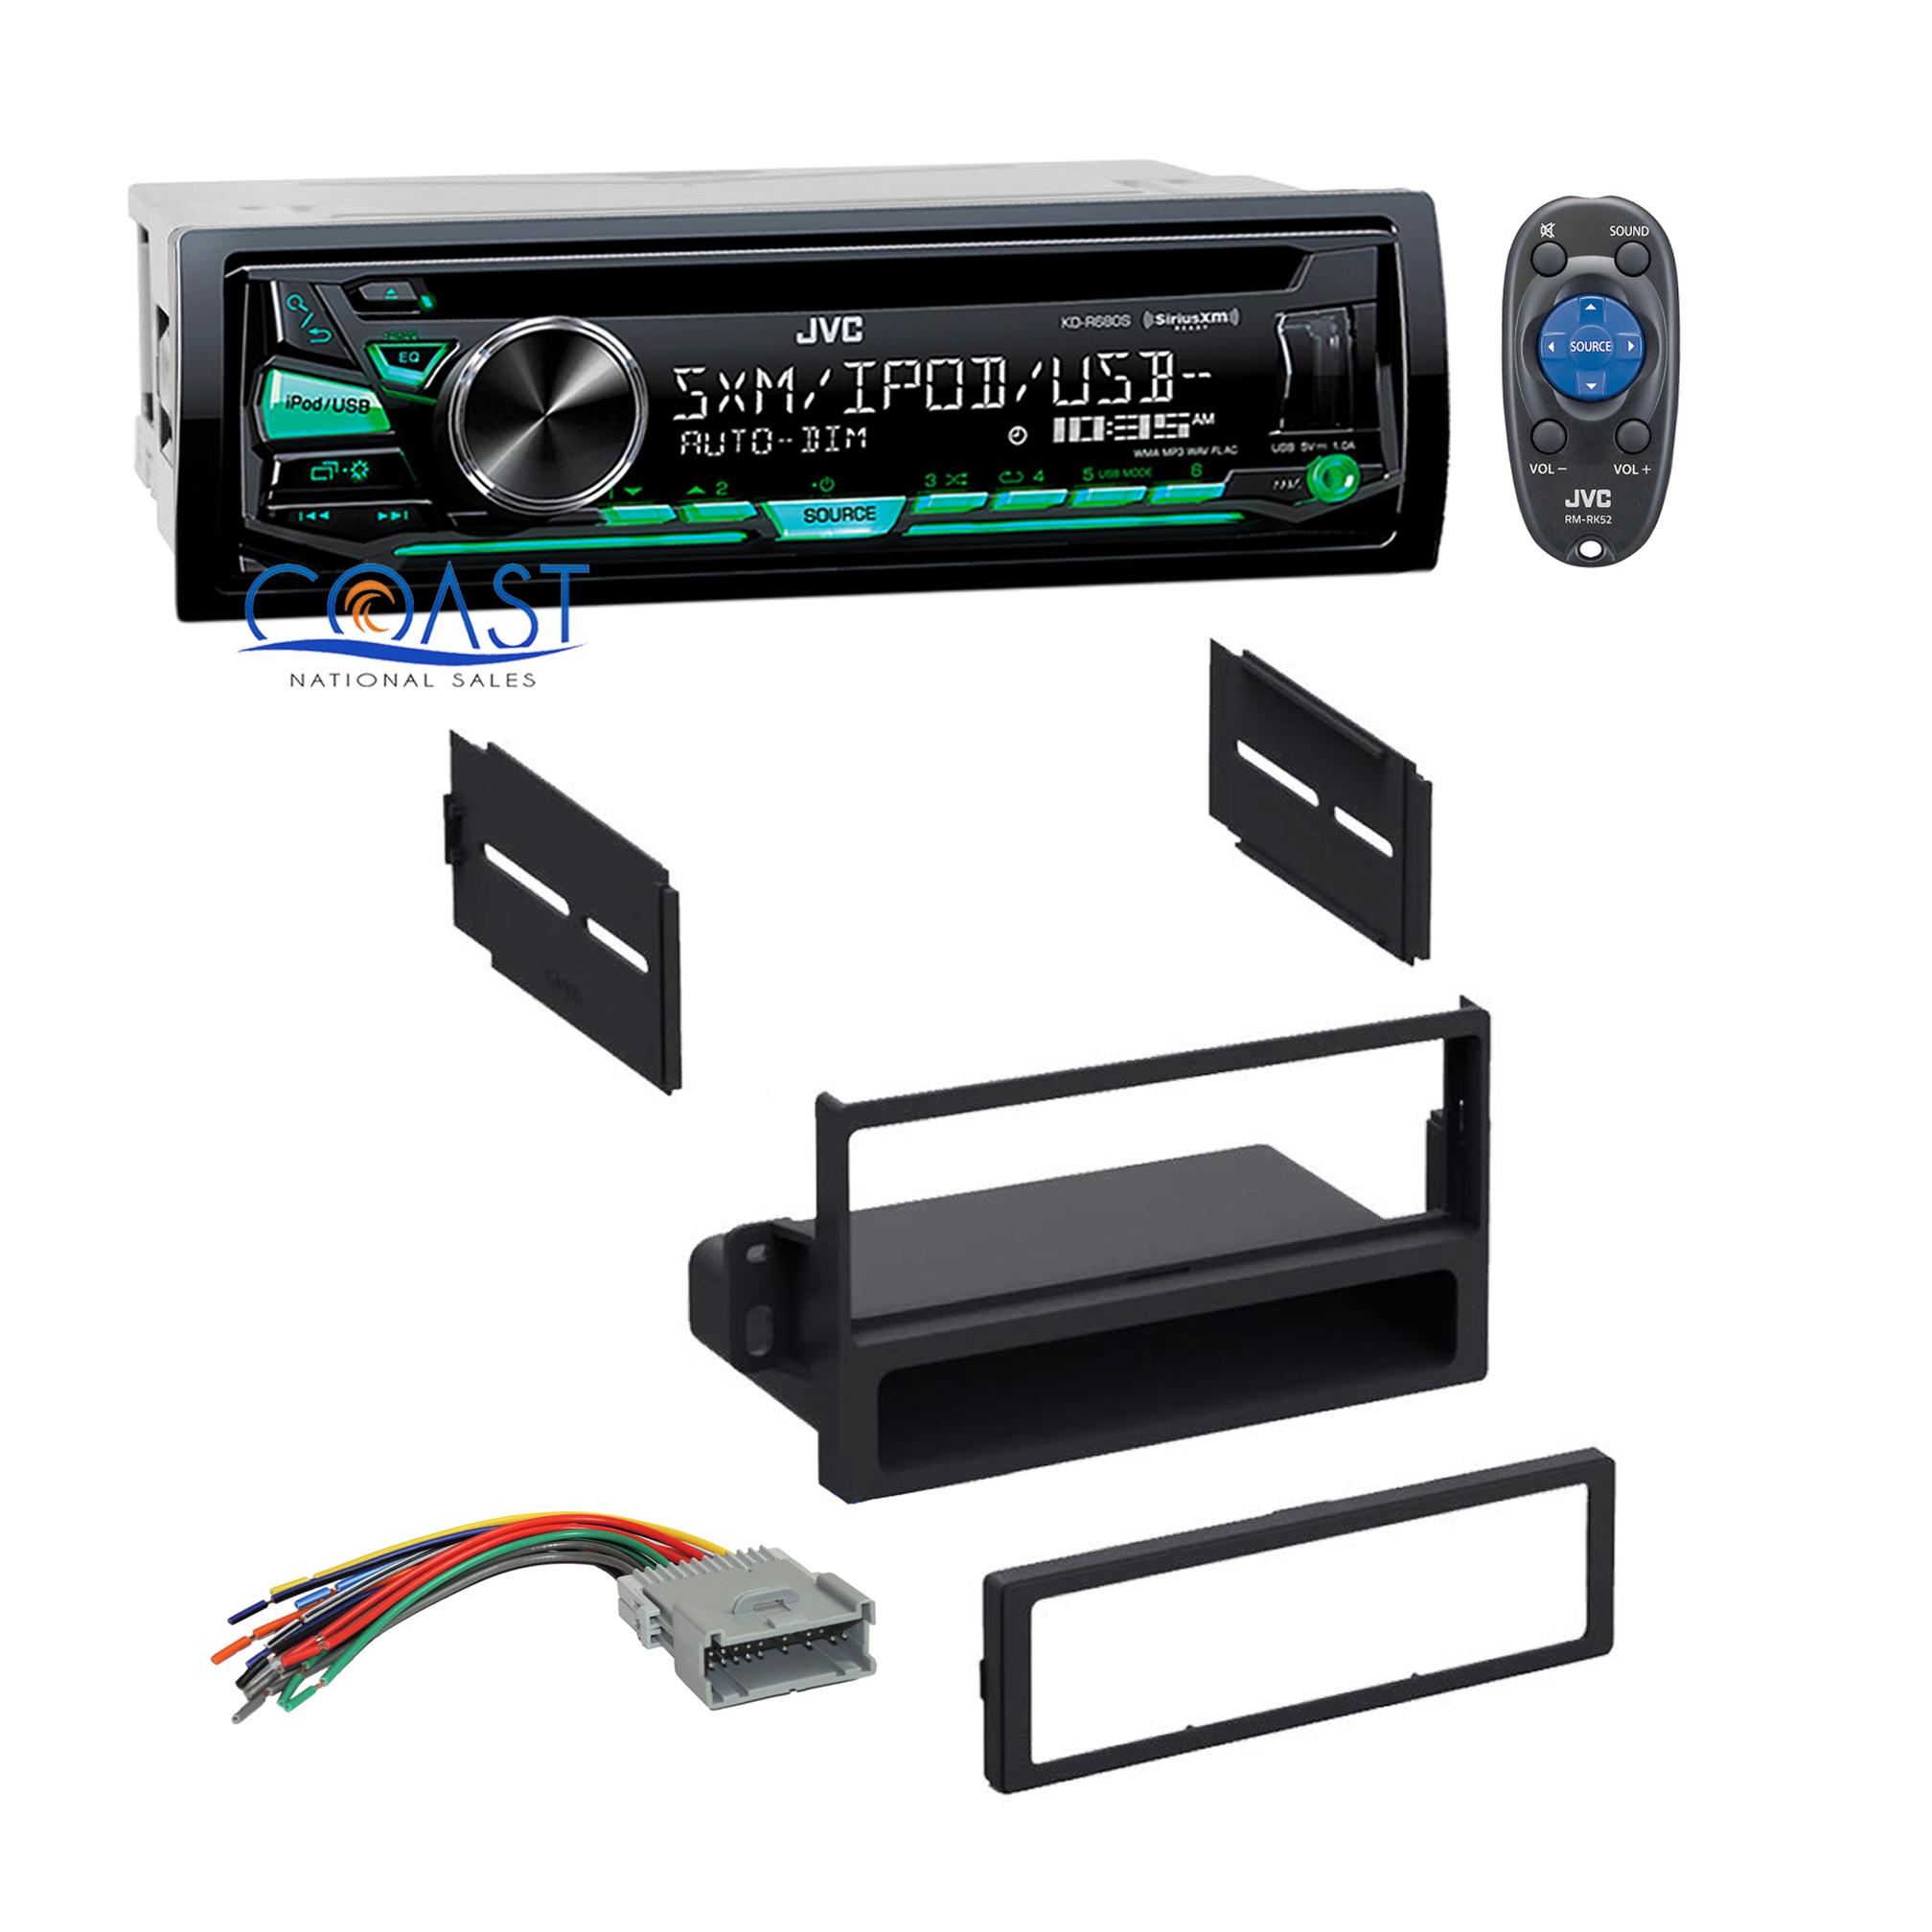 jvc car stereo wiring harness zk 8373  jvc car stereo wiring harness size wiring diagram  jvc car stereo wiring harness size